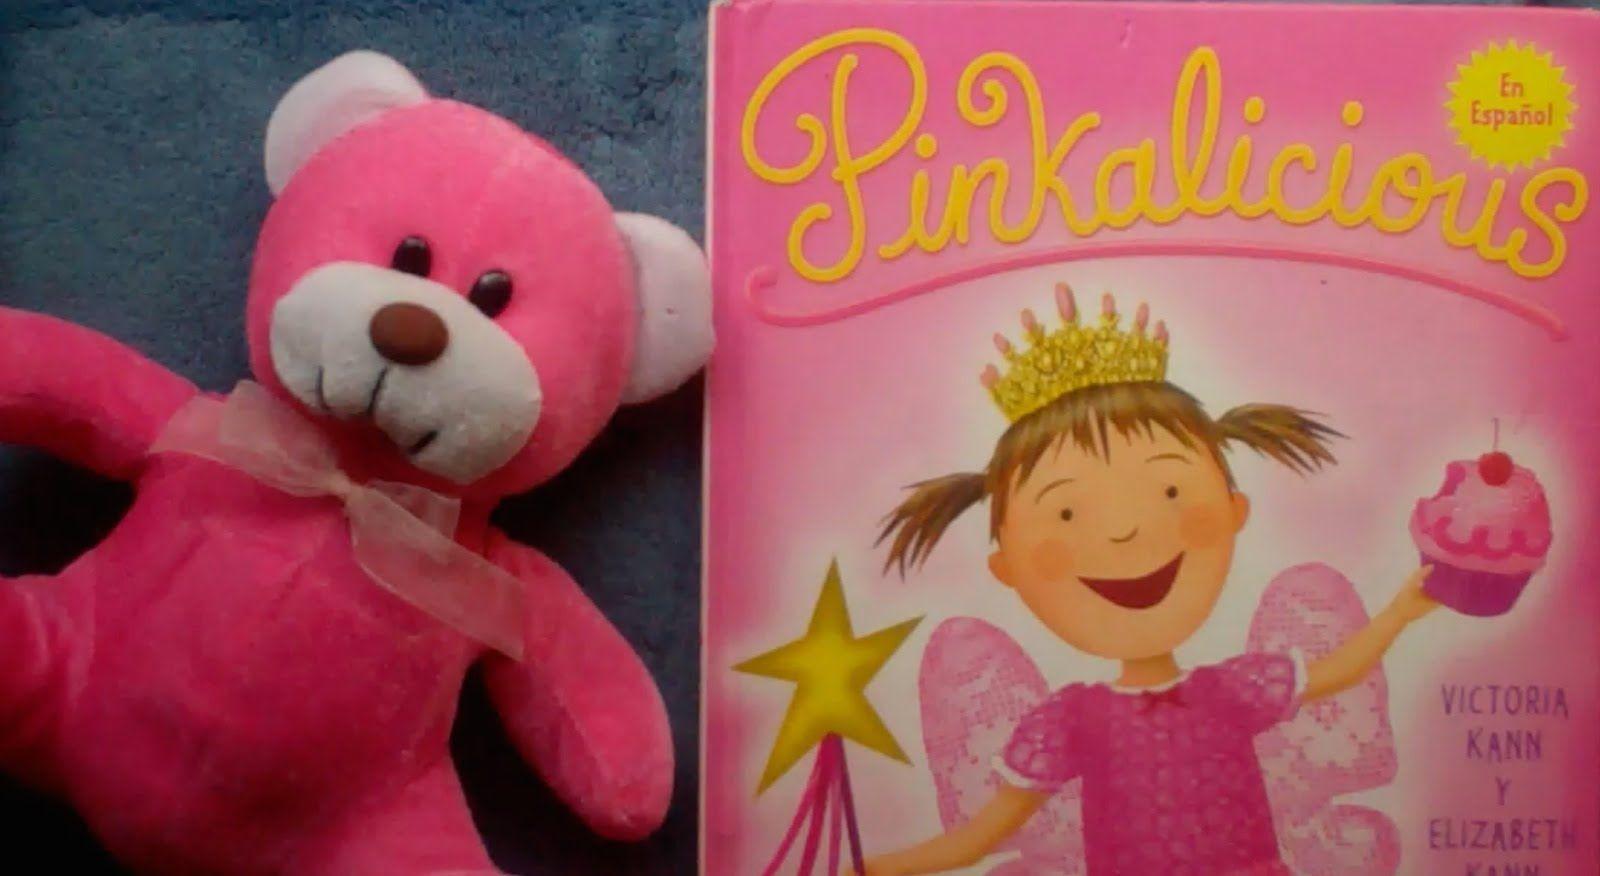 Pinkalicious En Espanol Amp Translated Into English Read